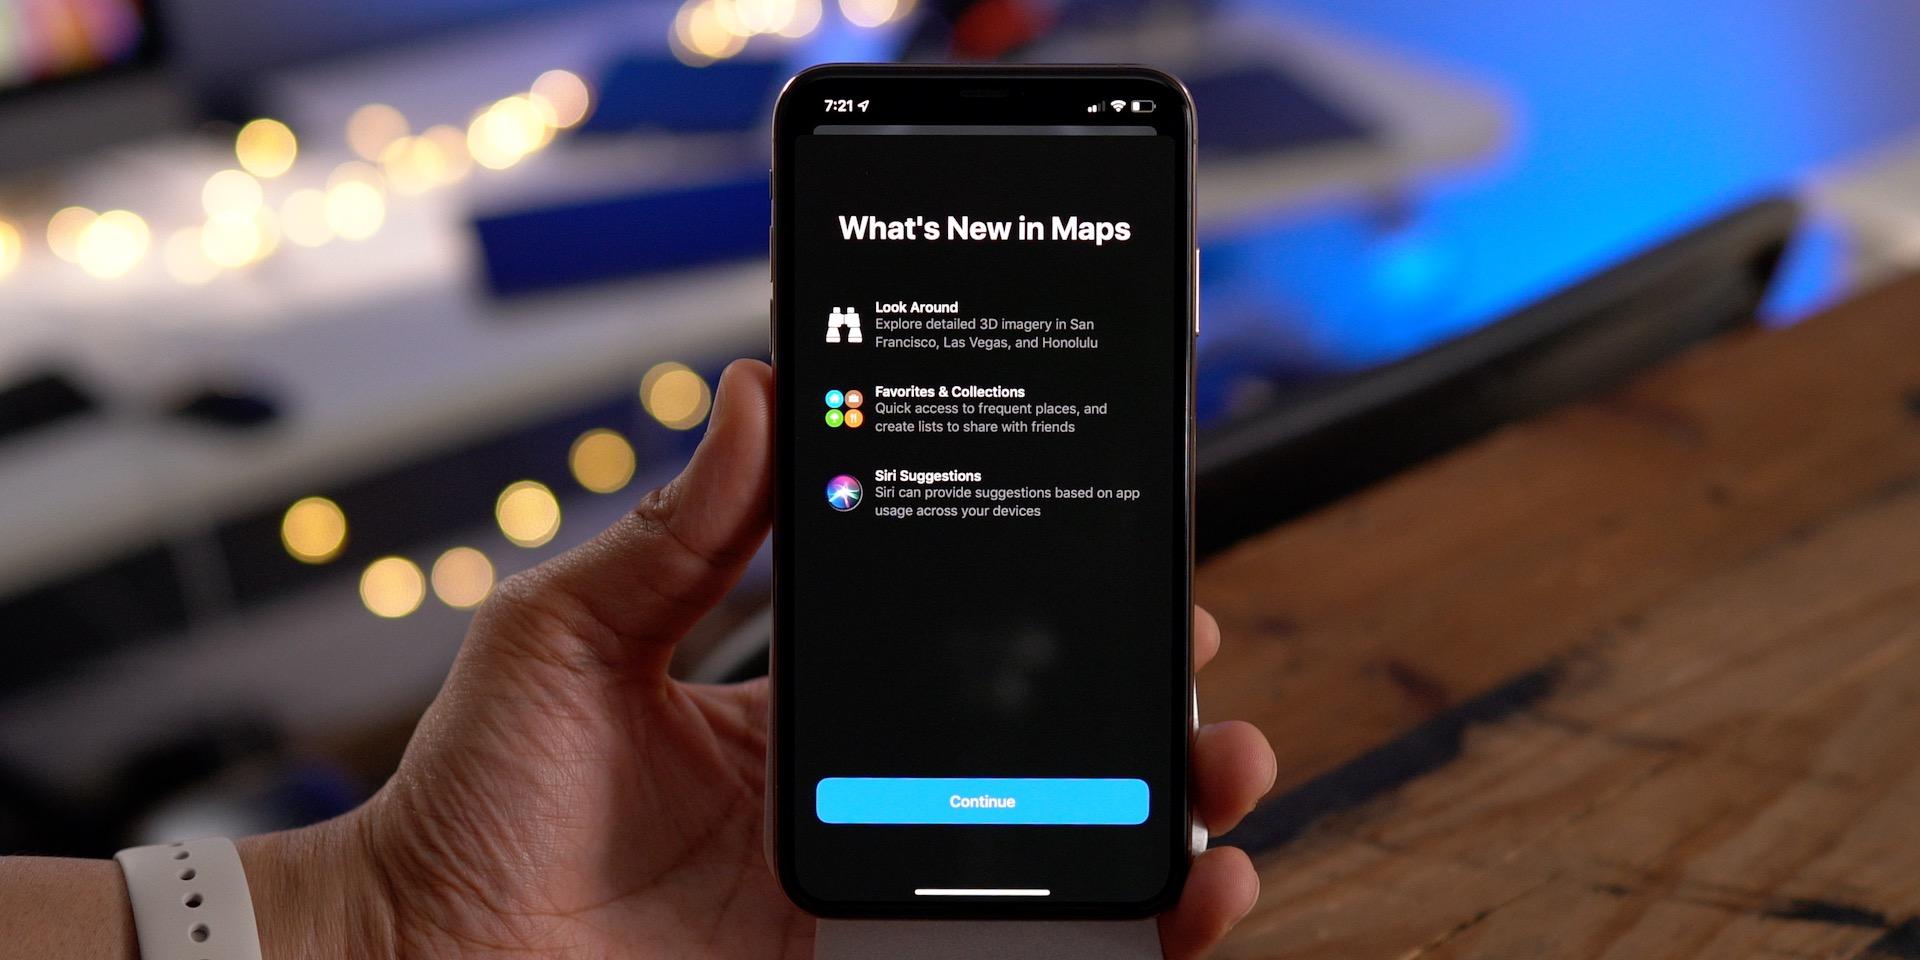 Maps Splash Screen